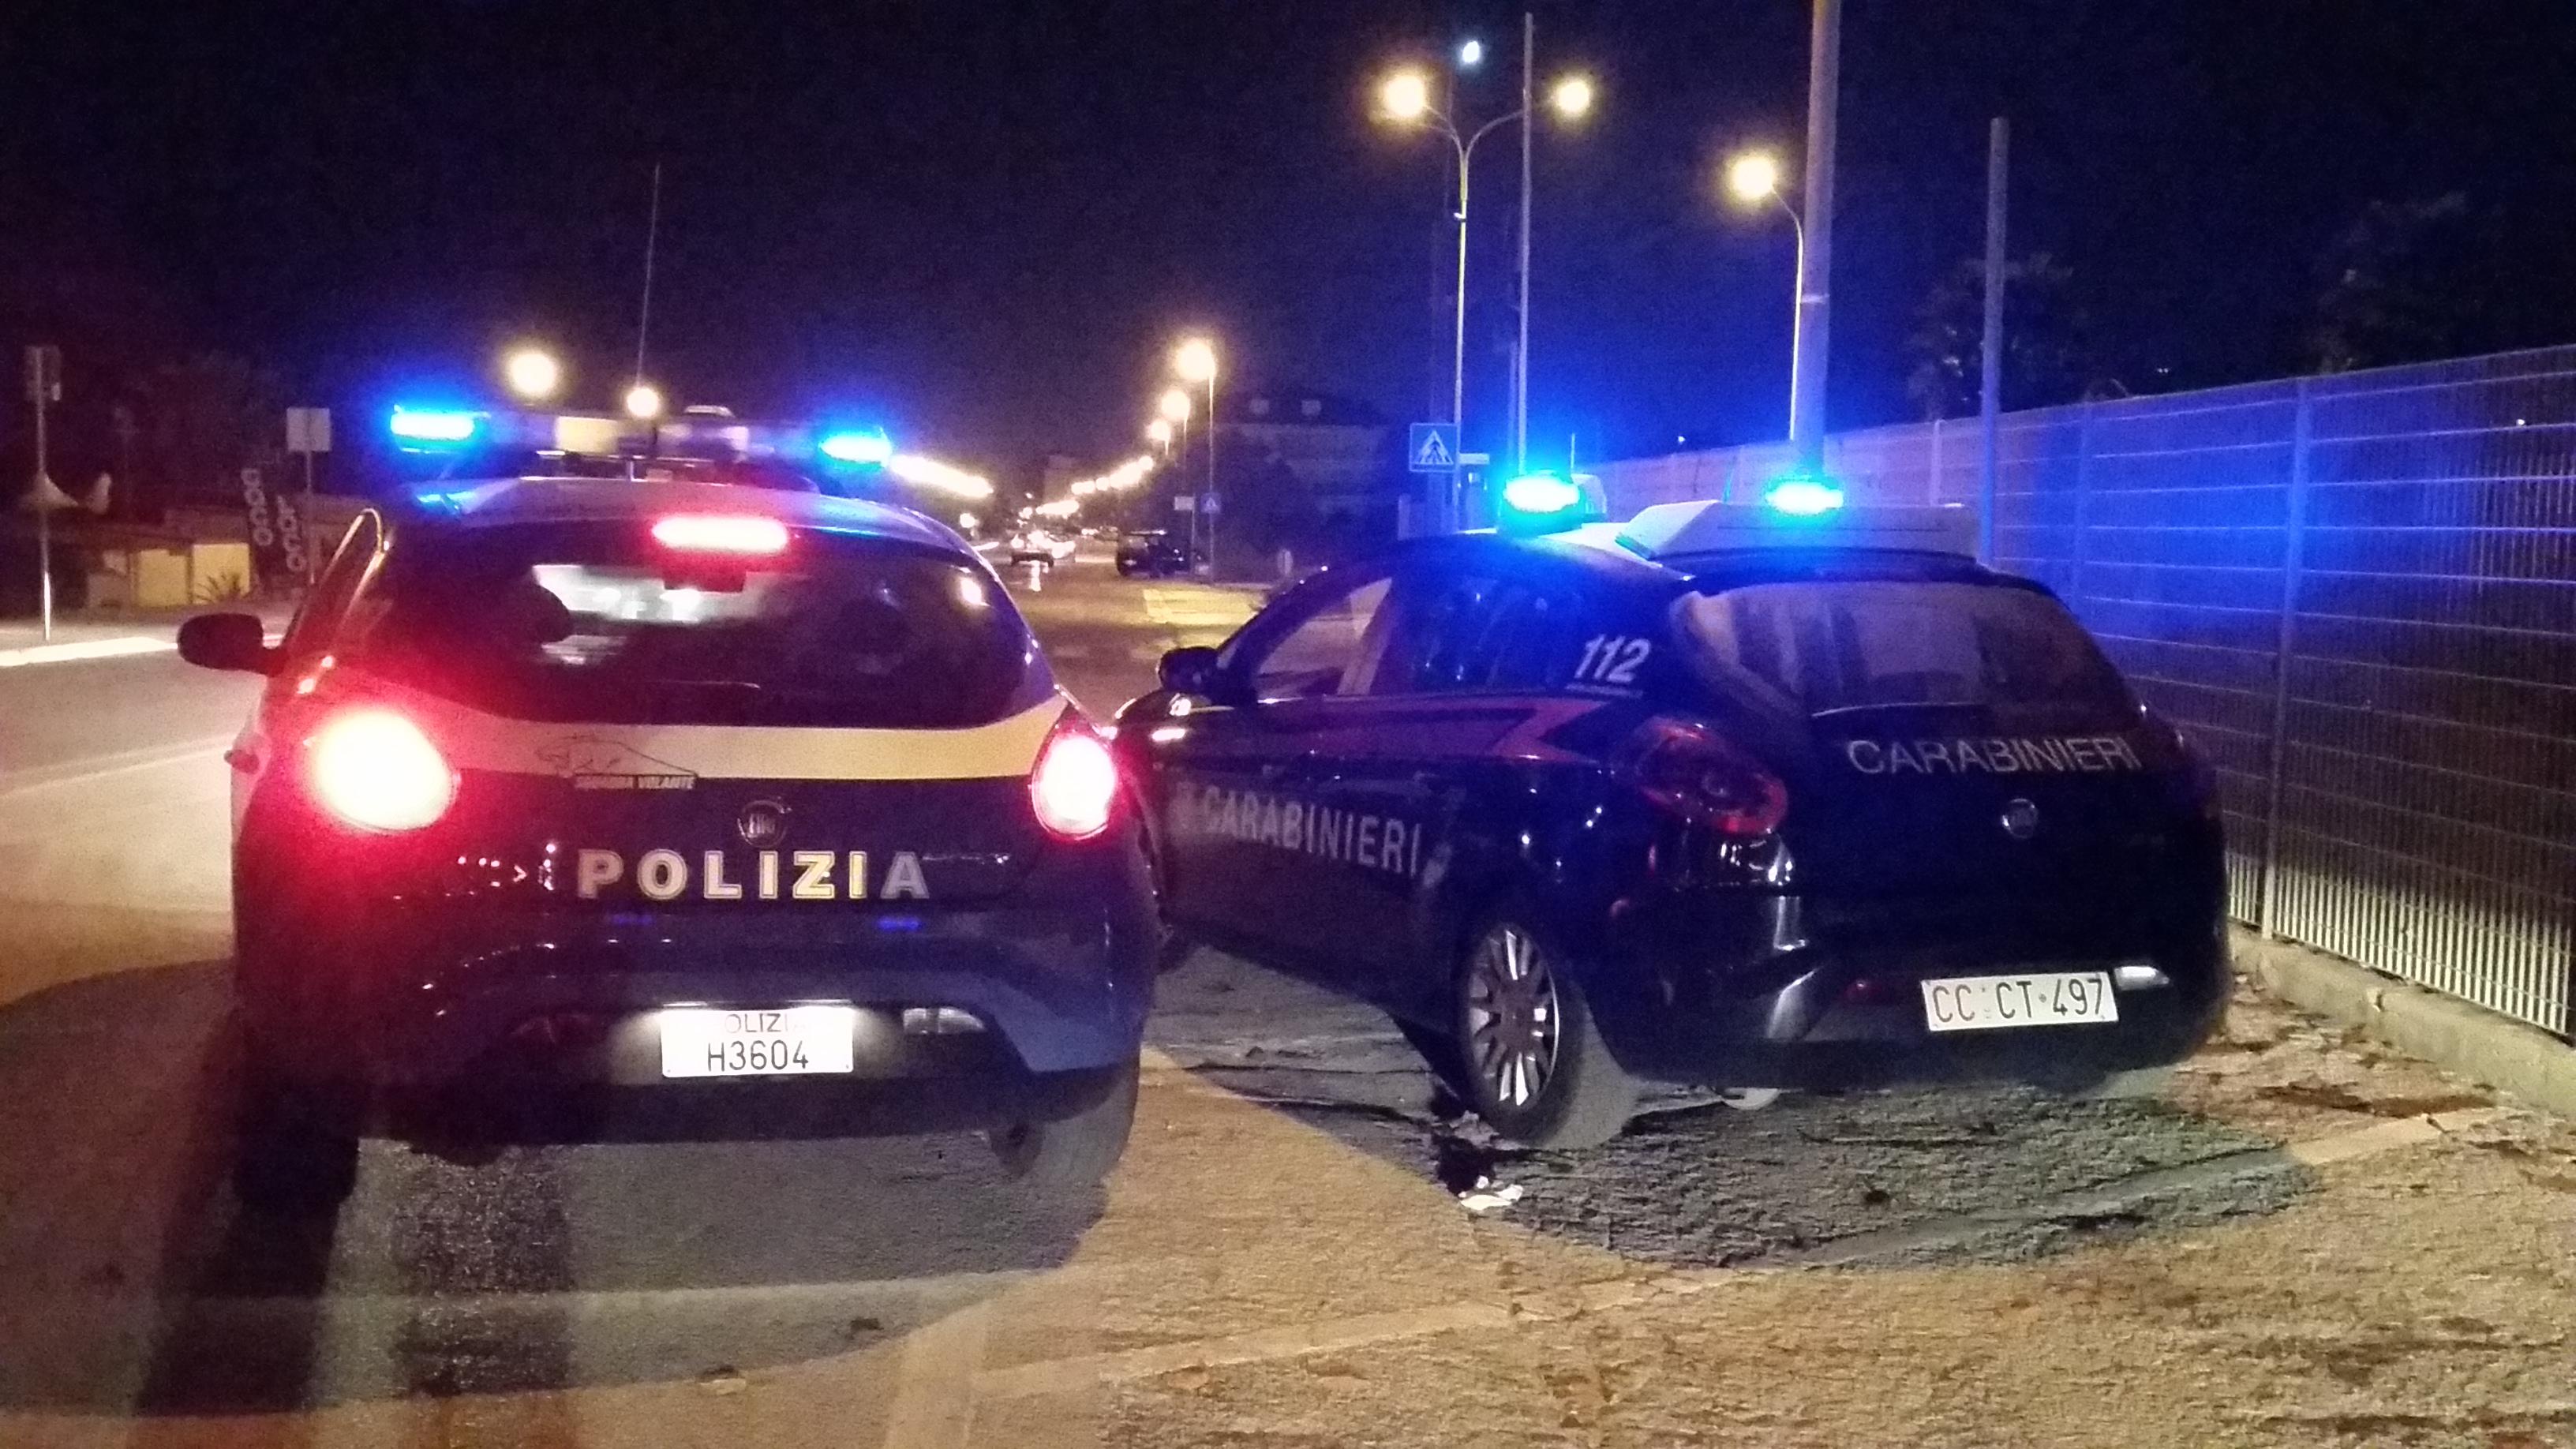 polizia e carabinieri notte